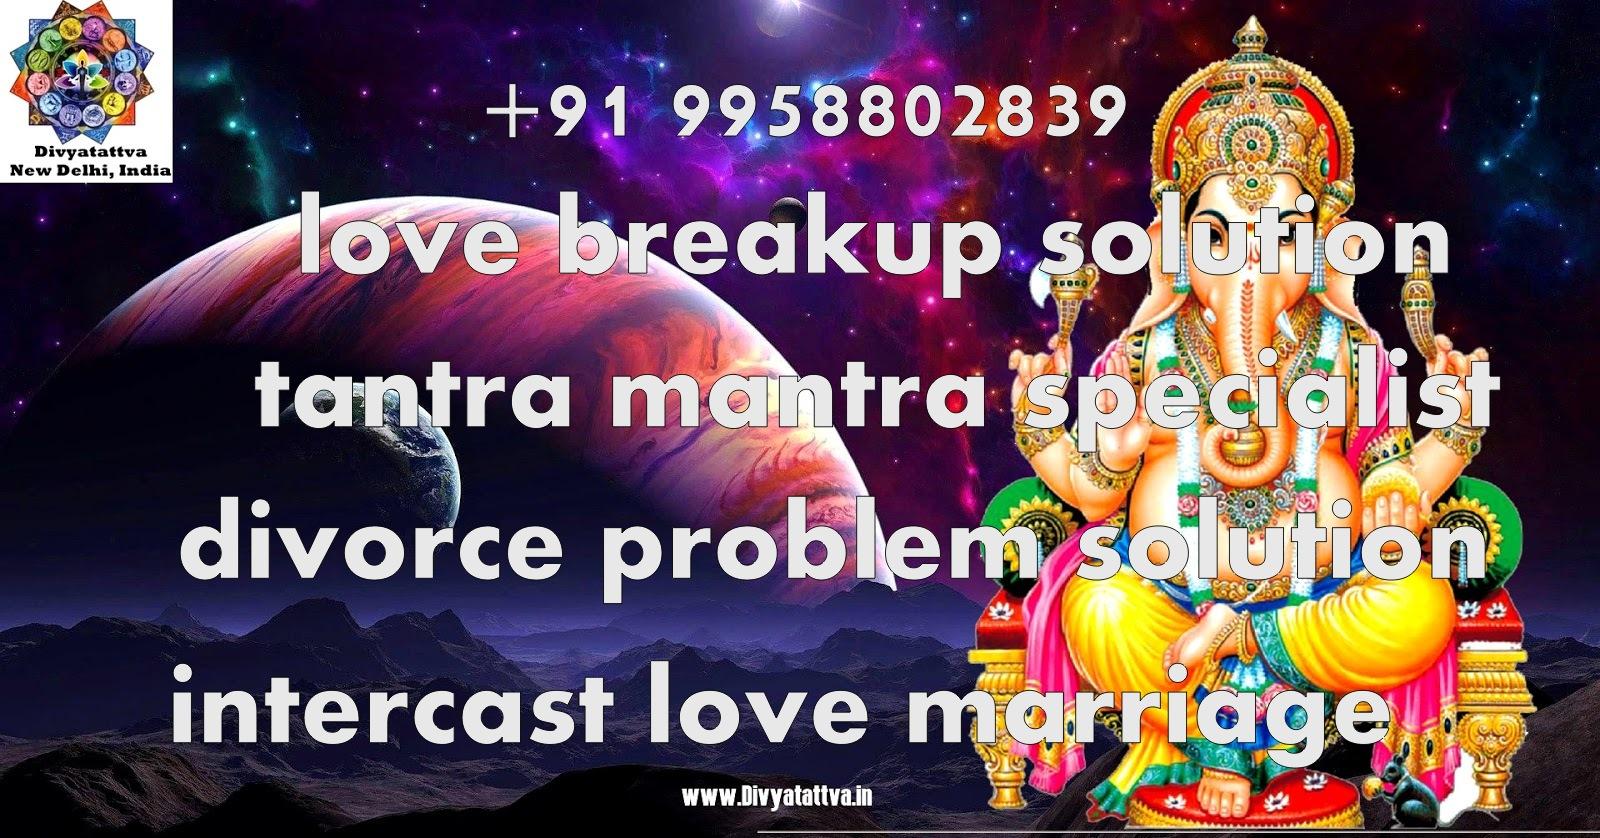 ALL PROBLEM SOLUTION ASTROLOGER images ~America~91 9958802839